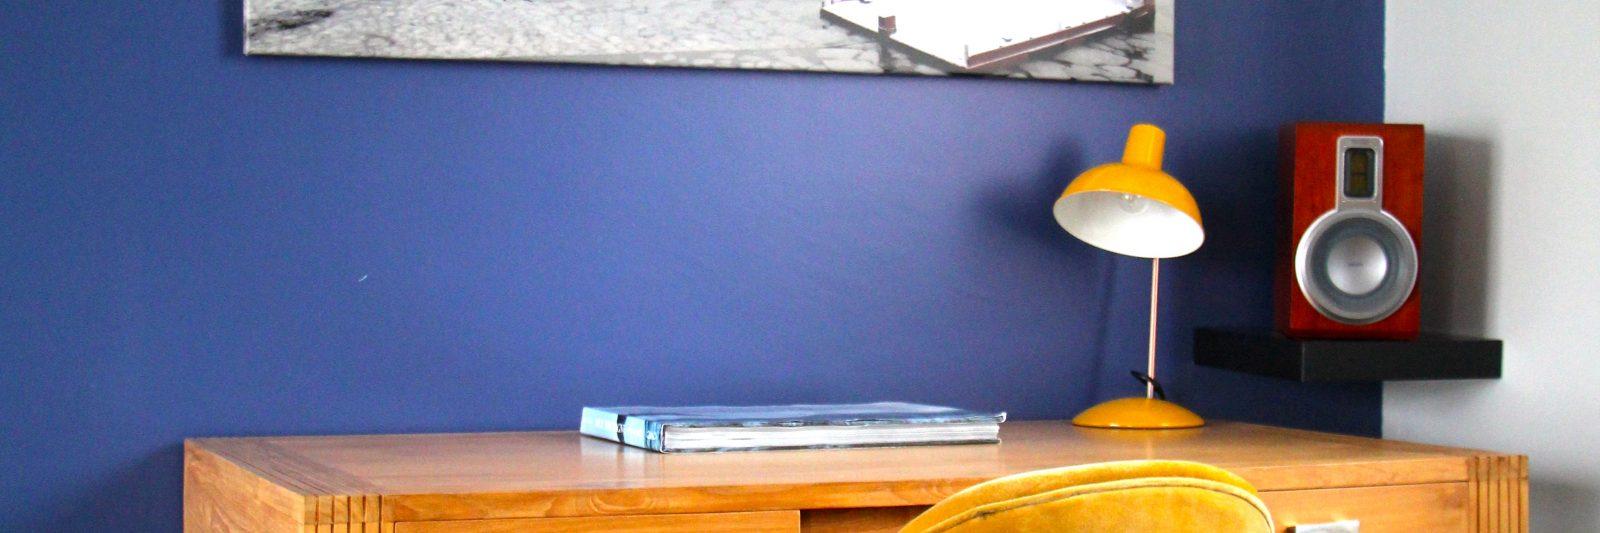 Gite Ploubazlanec Suite Skipper bureau